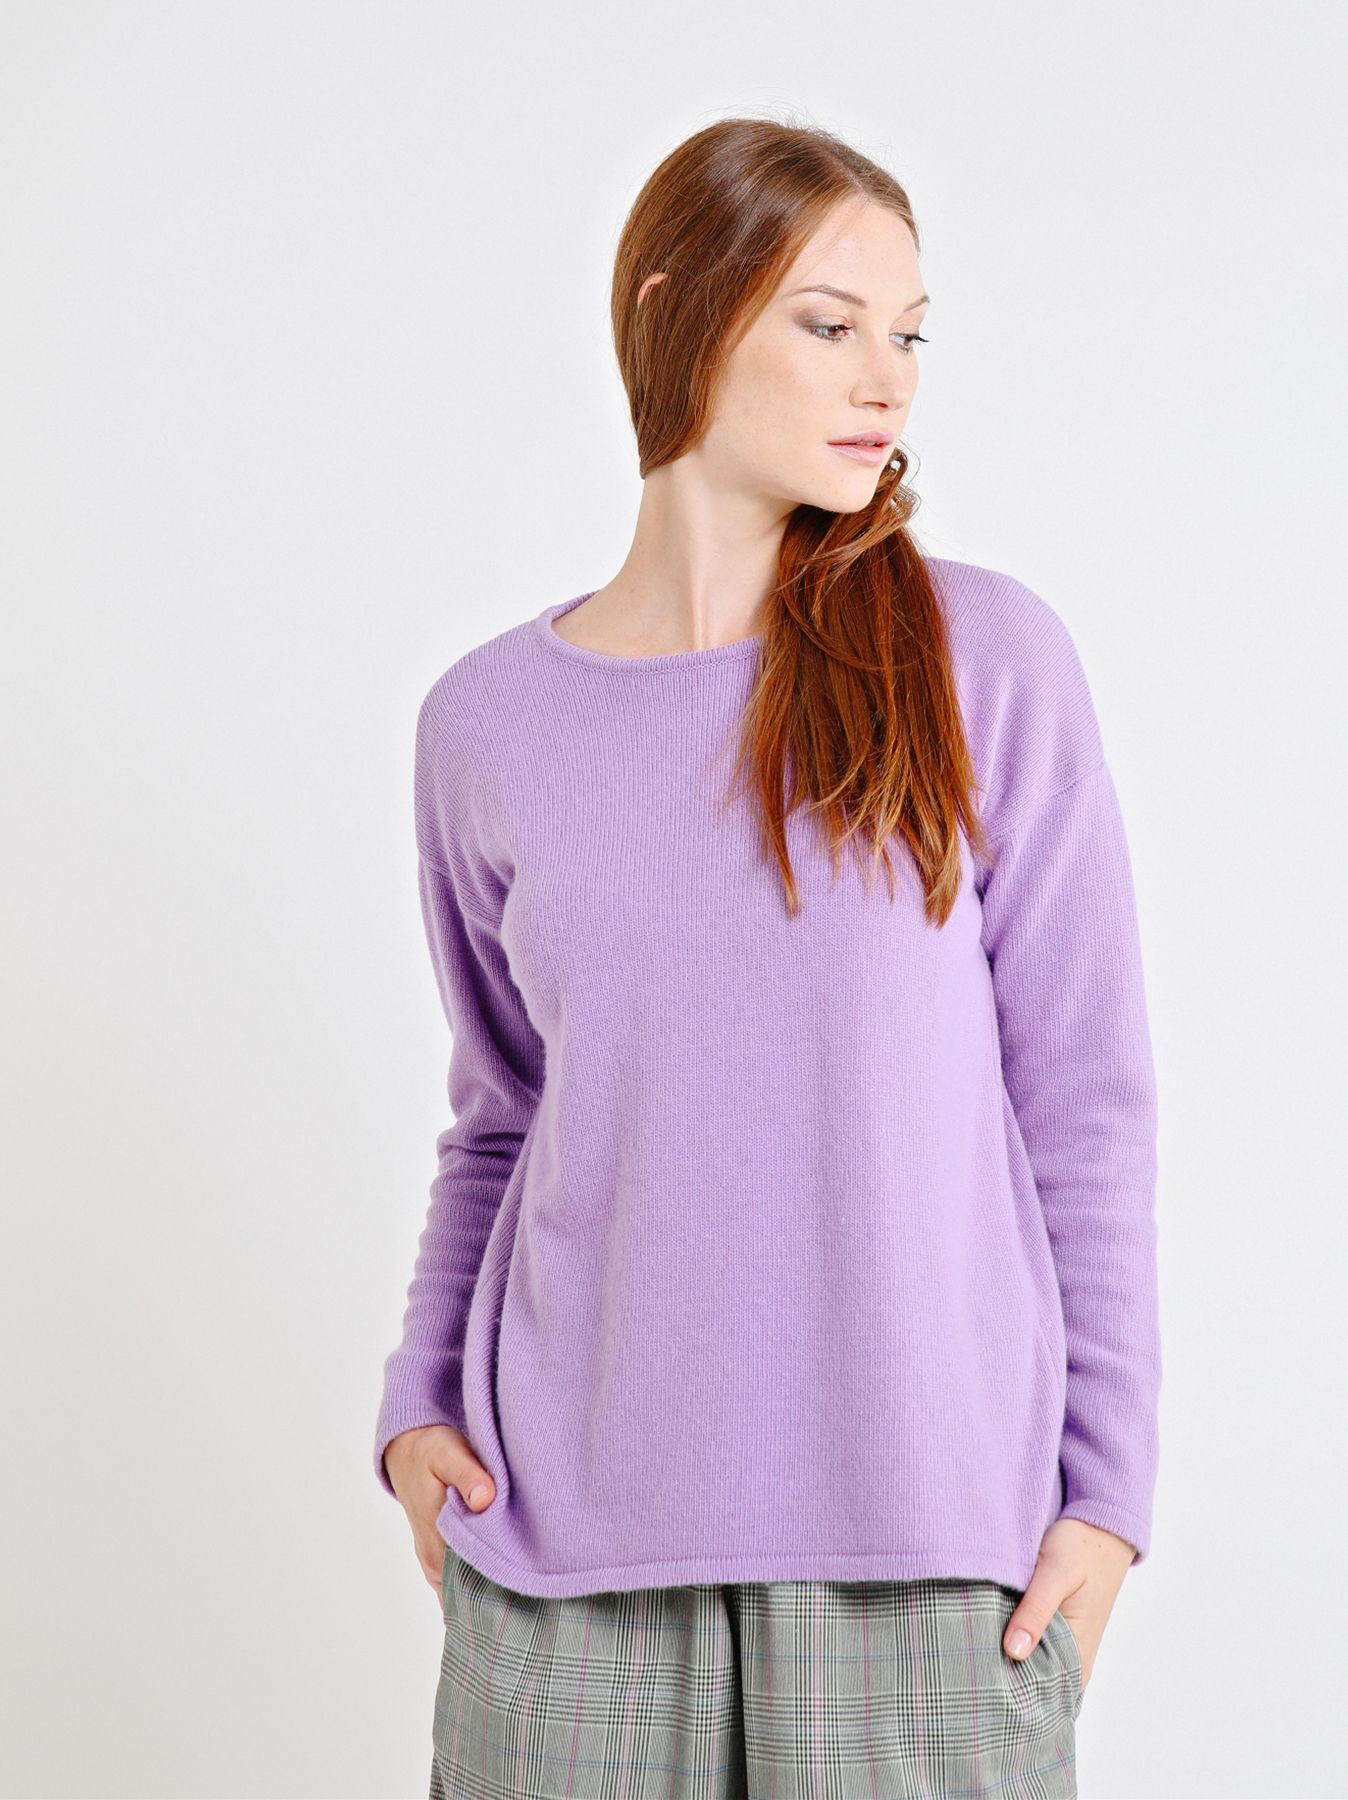 Box shaped body knit jumper